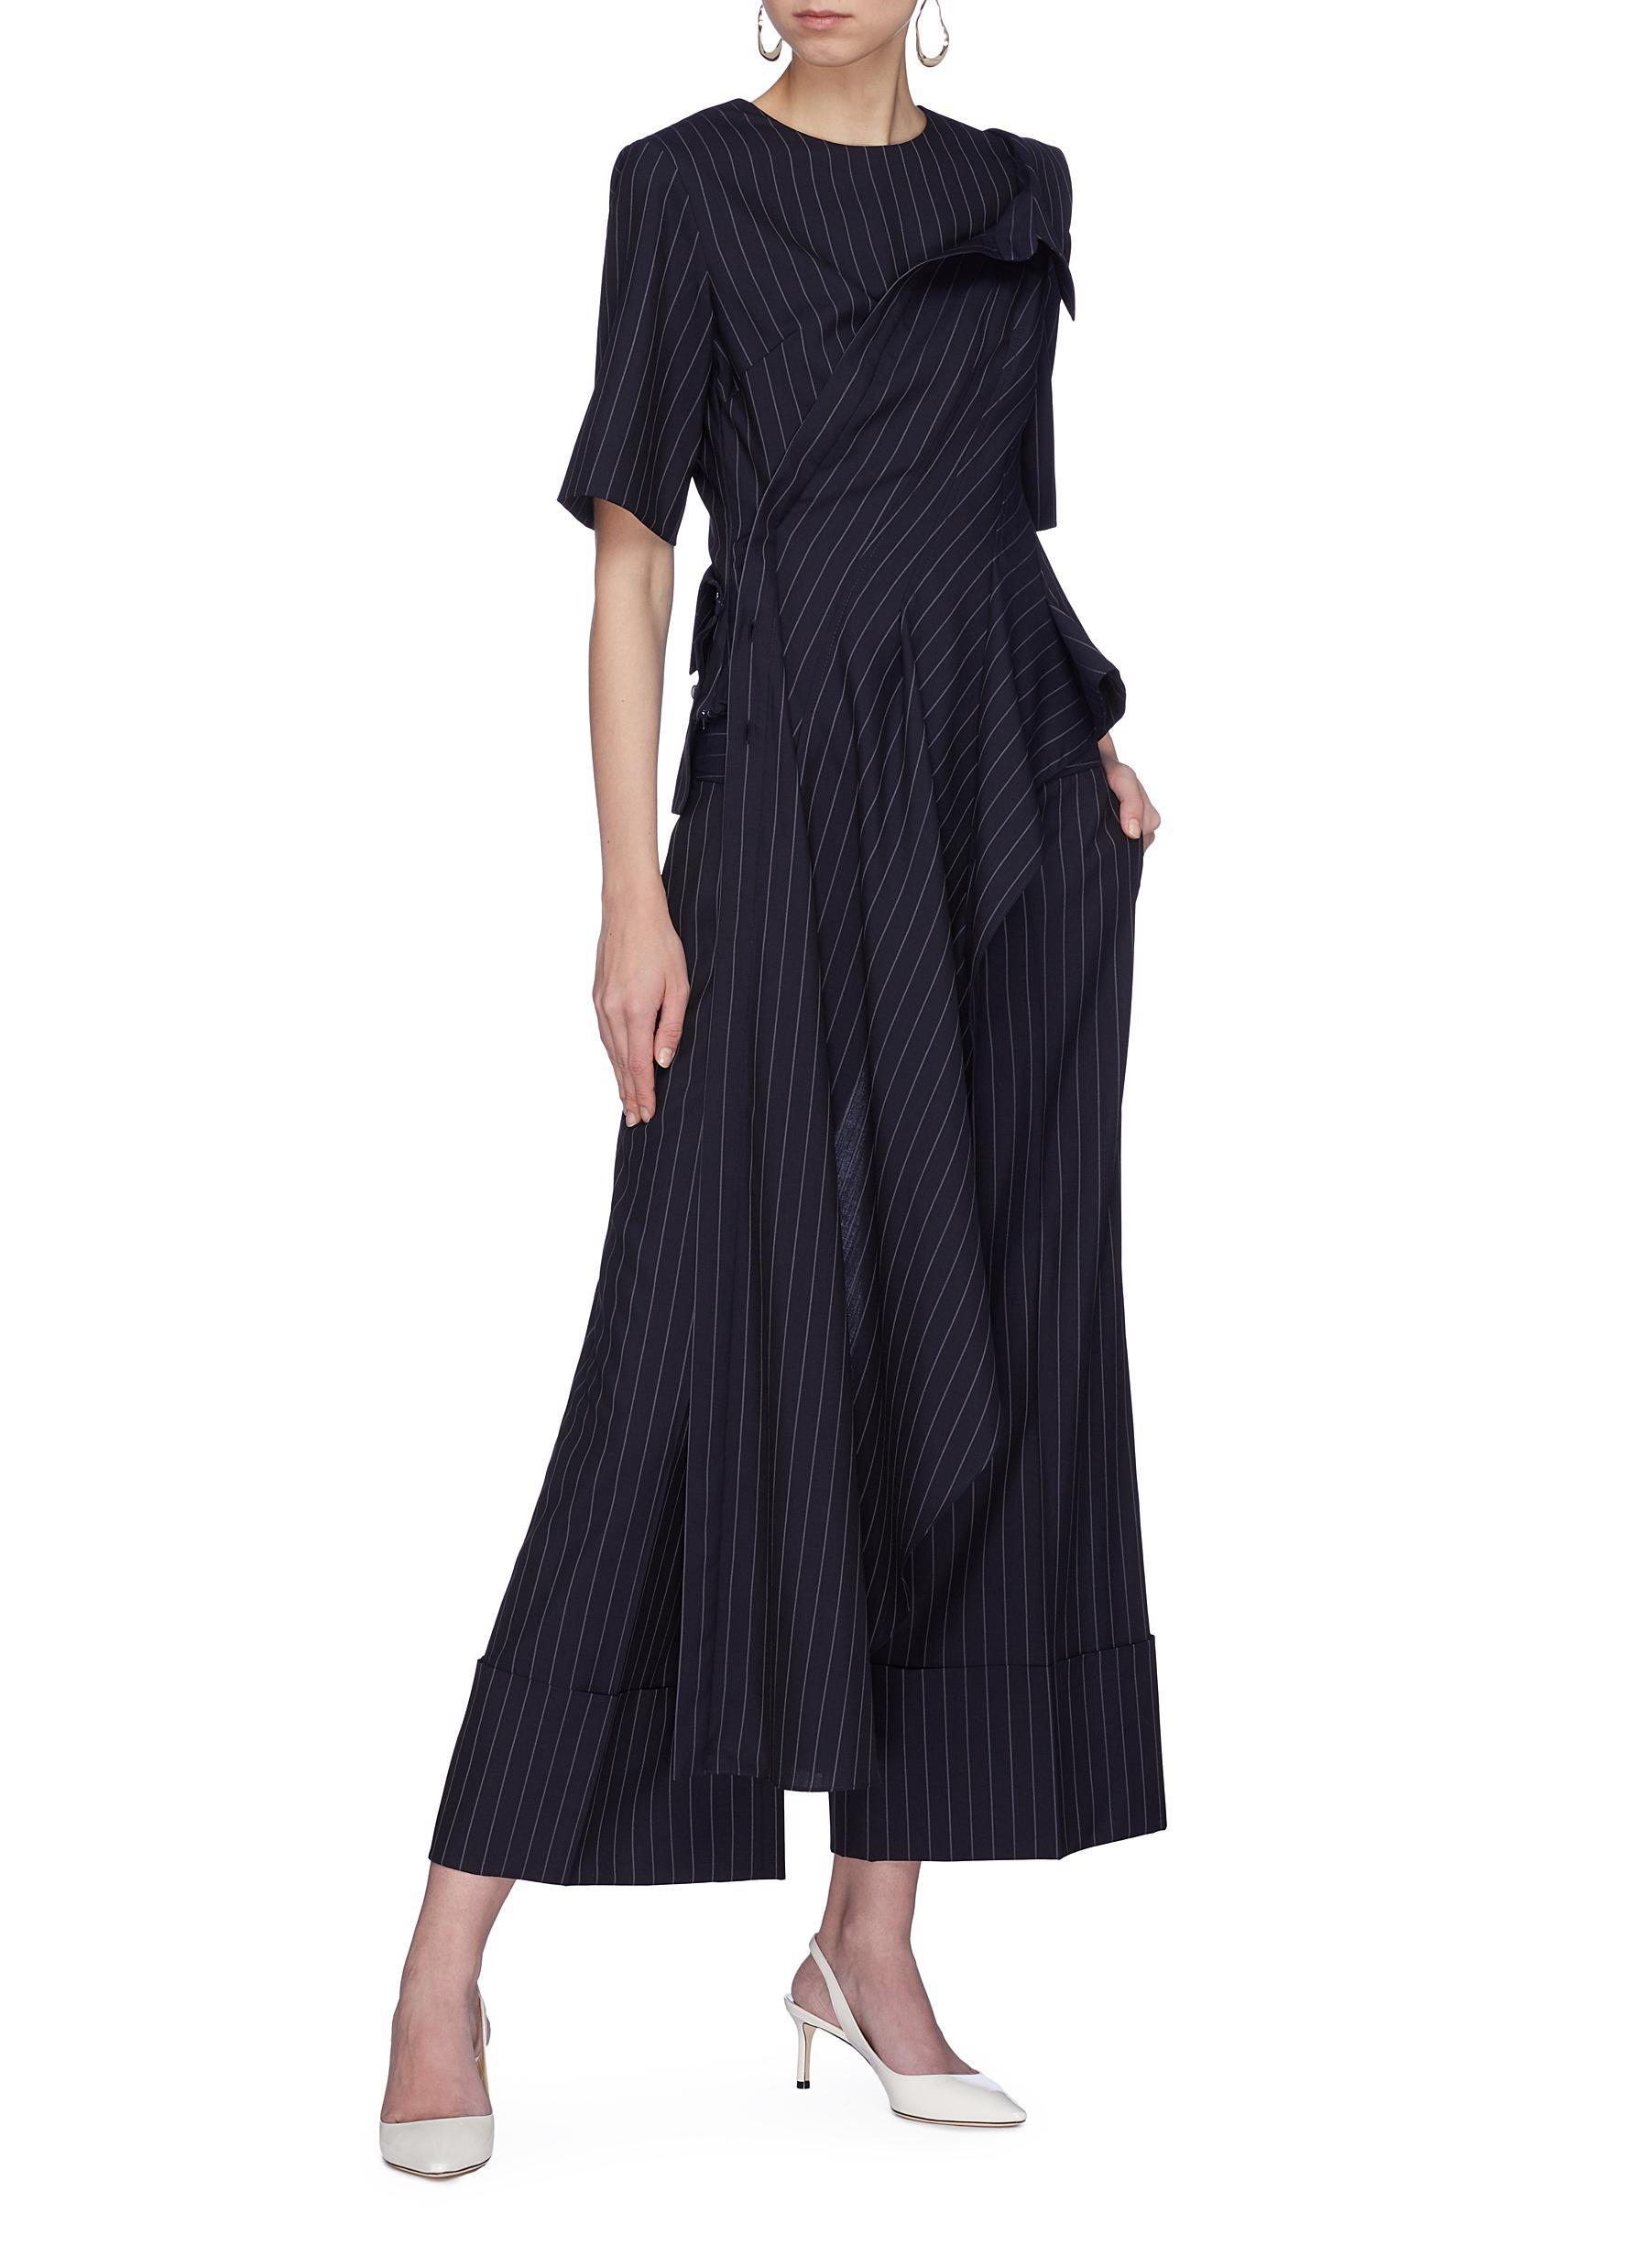 26e77e2c5fe0 monse-designer-Multi-colour-Asymmetric-Drape-Panel-Pinstripe-Wool-Top.jpeg